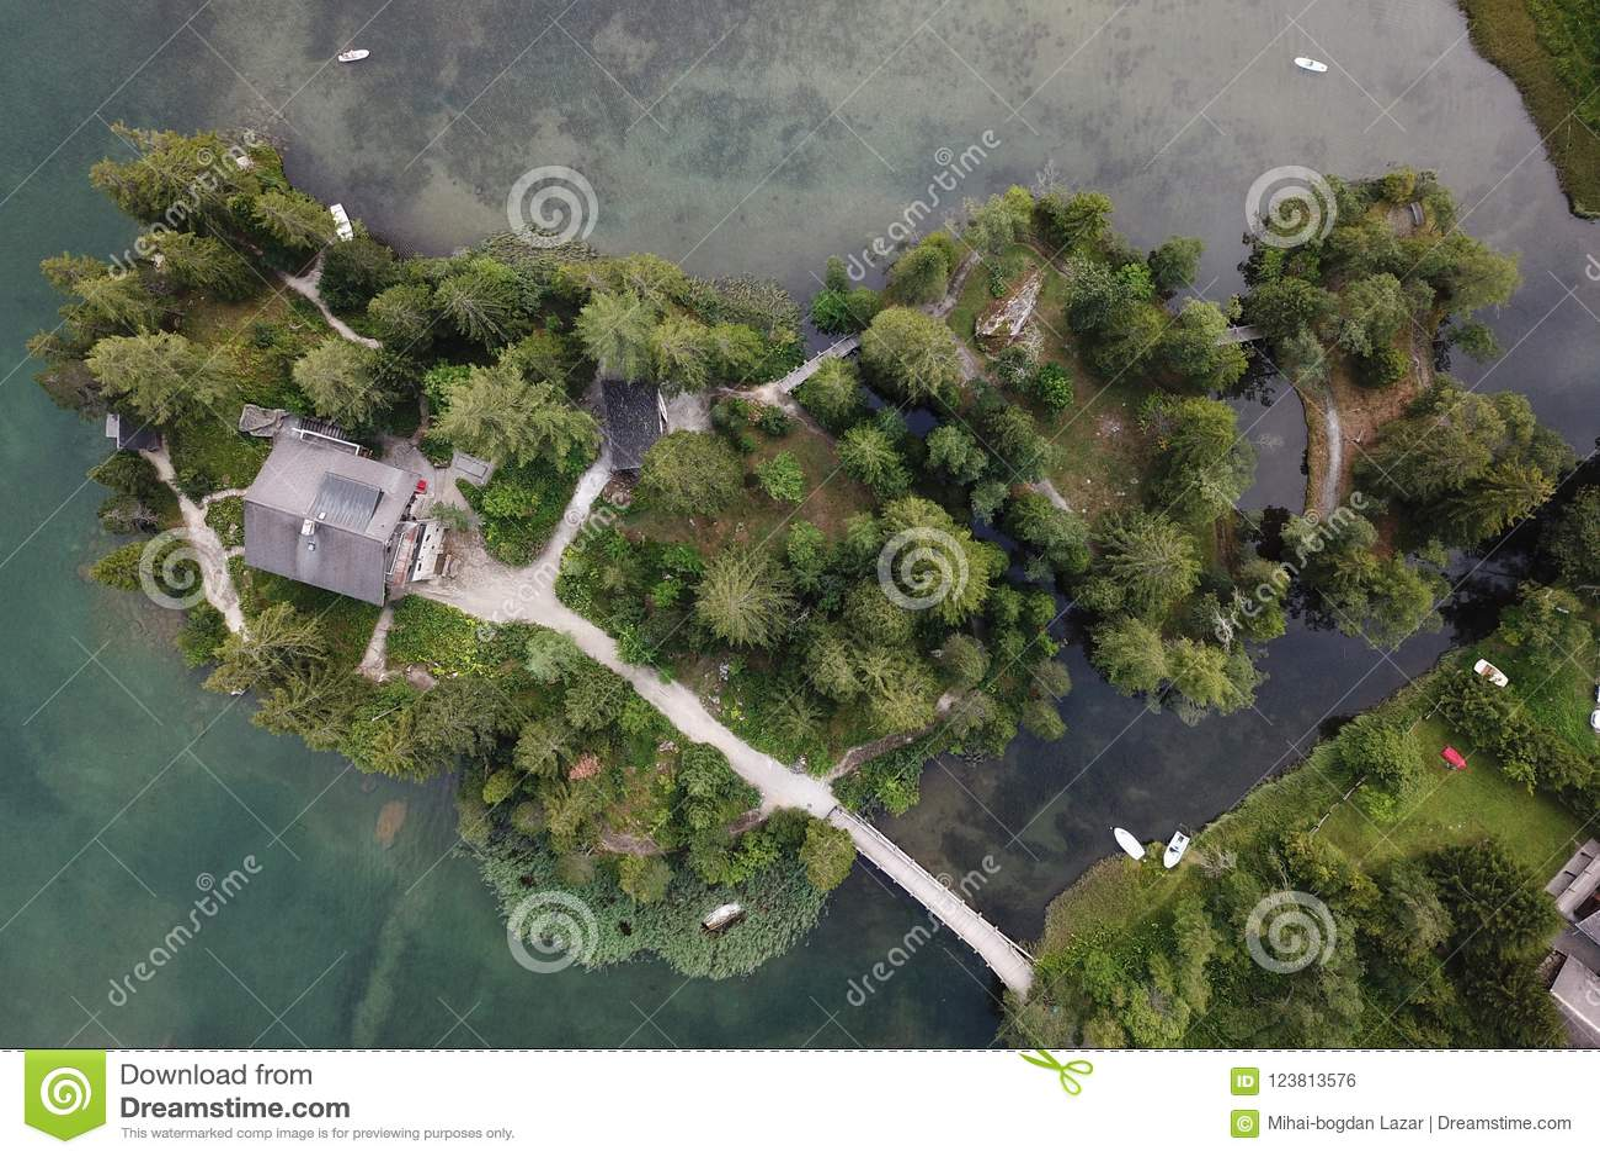 Champex Lac, Switzerland